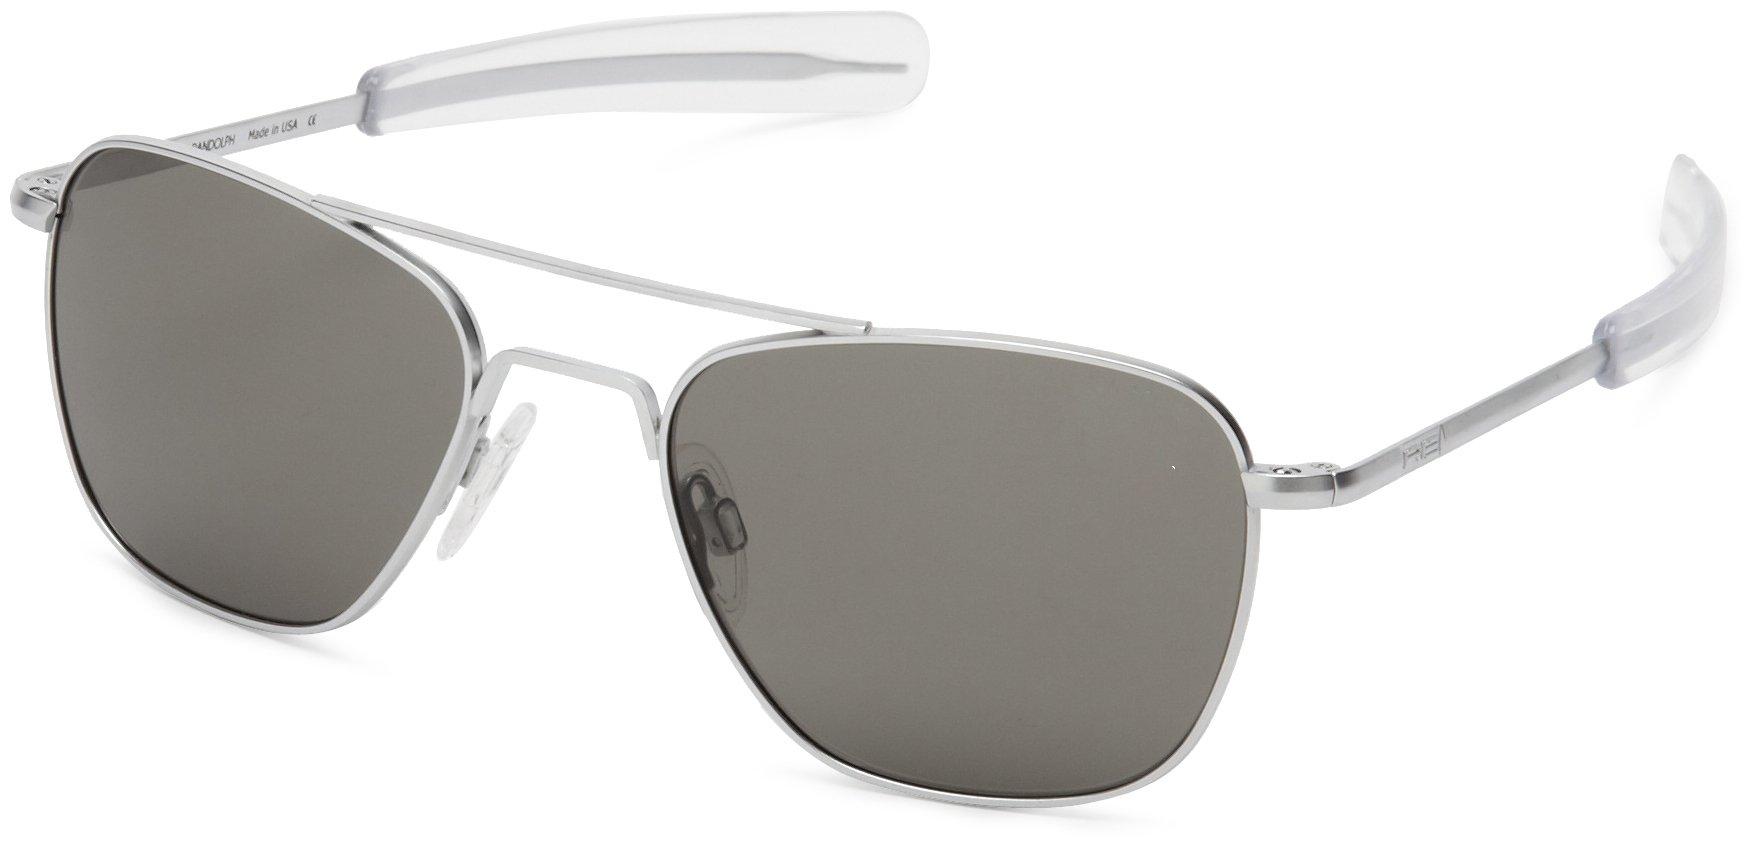 Randolph Aviator Square Sunglasses, 55, Matte Chrome, Bayonet, Gray Lenses